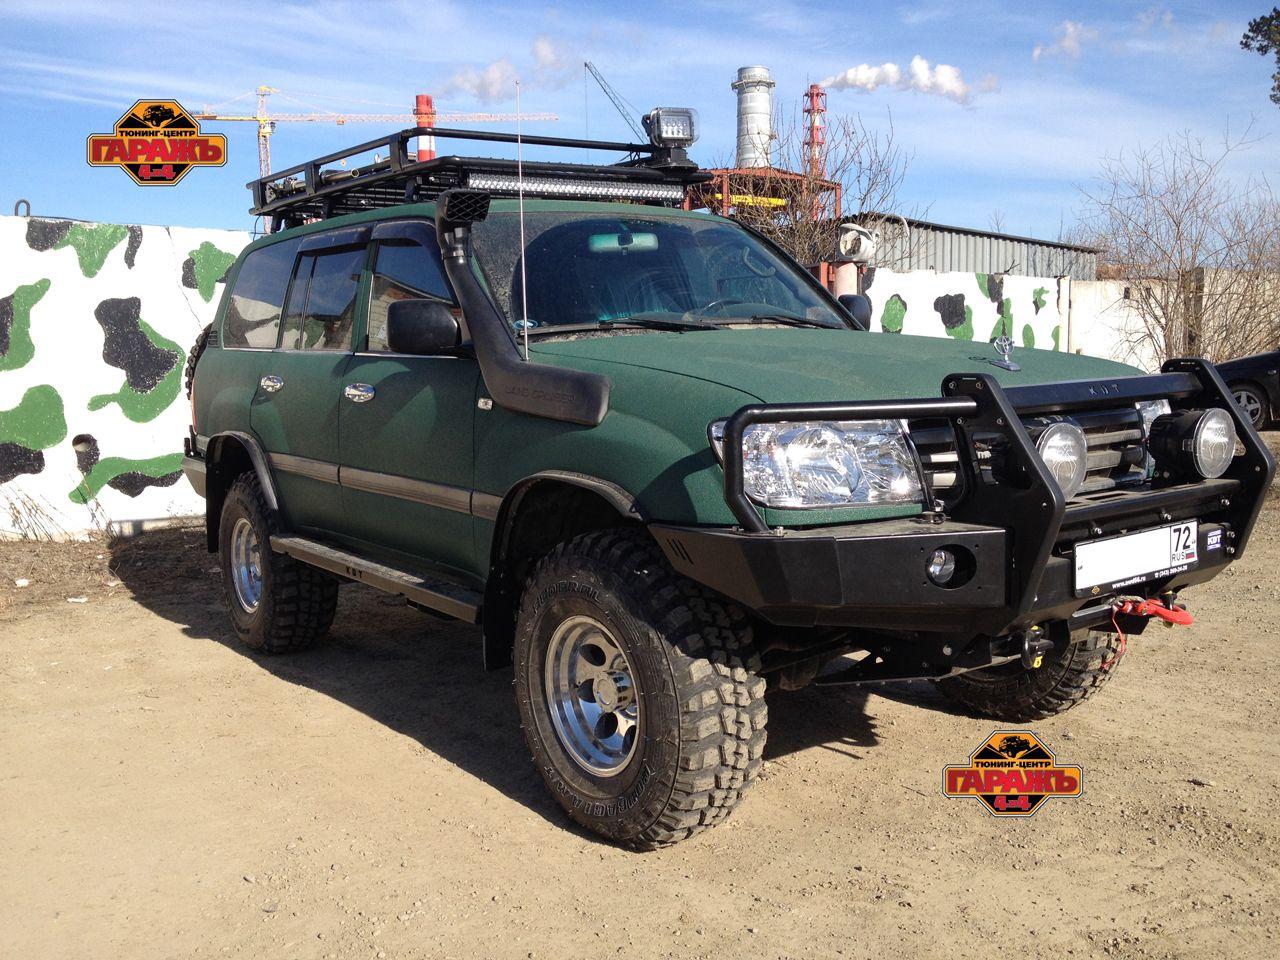 Kelebihan Kekurangan Toyota Land Cruiser 105 Spesifikasi